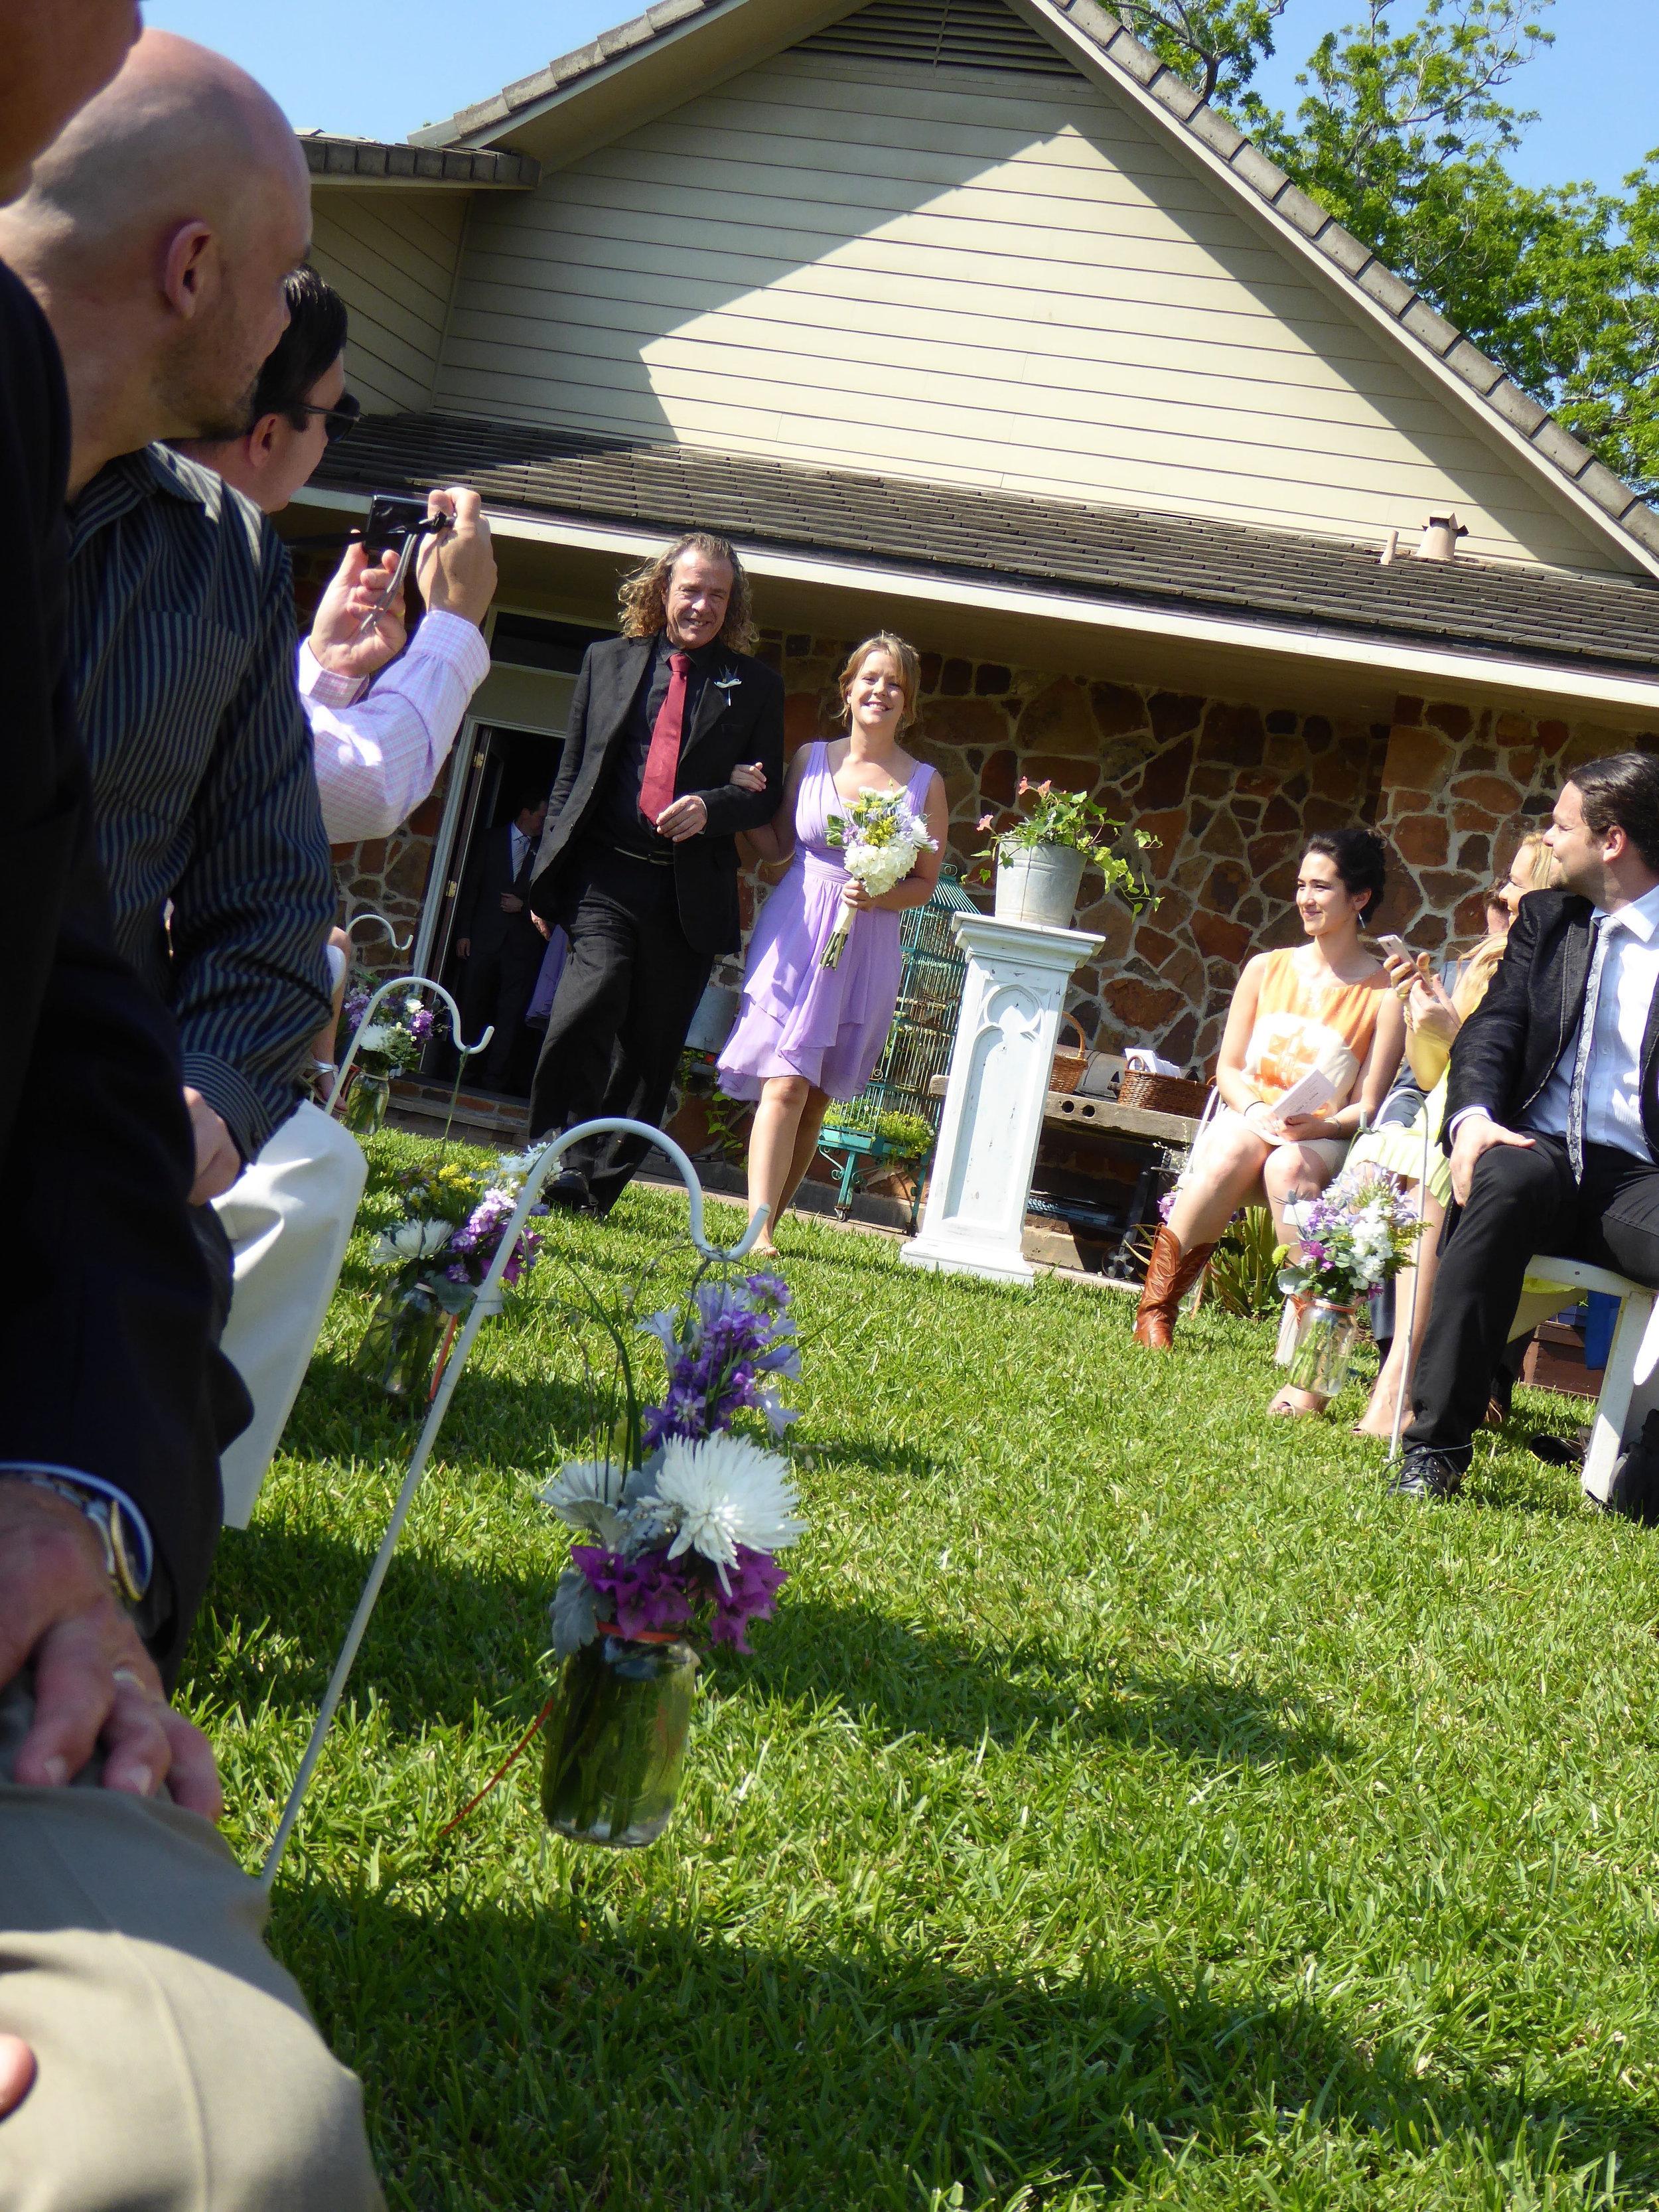 cindi_wedding_flowers_spiritedtable_photo06.jpg